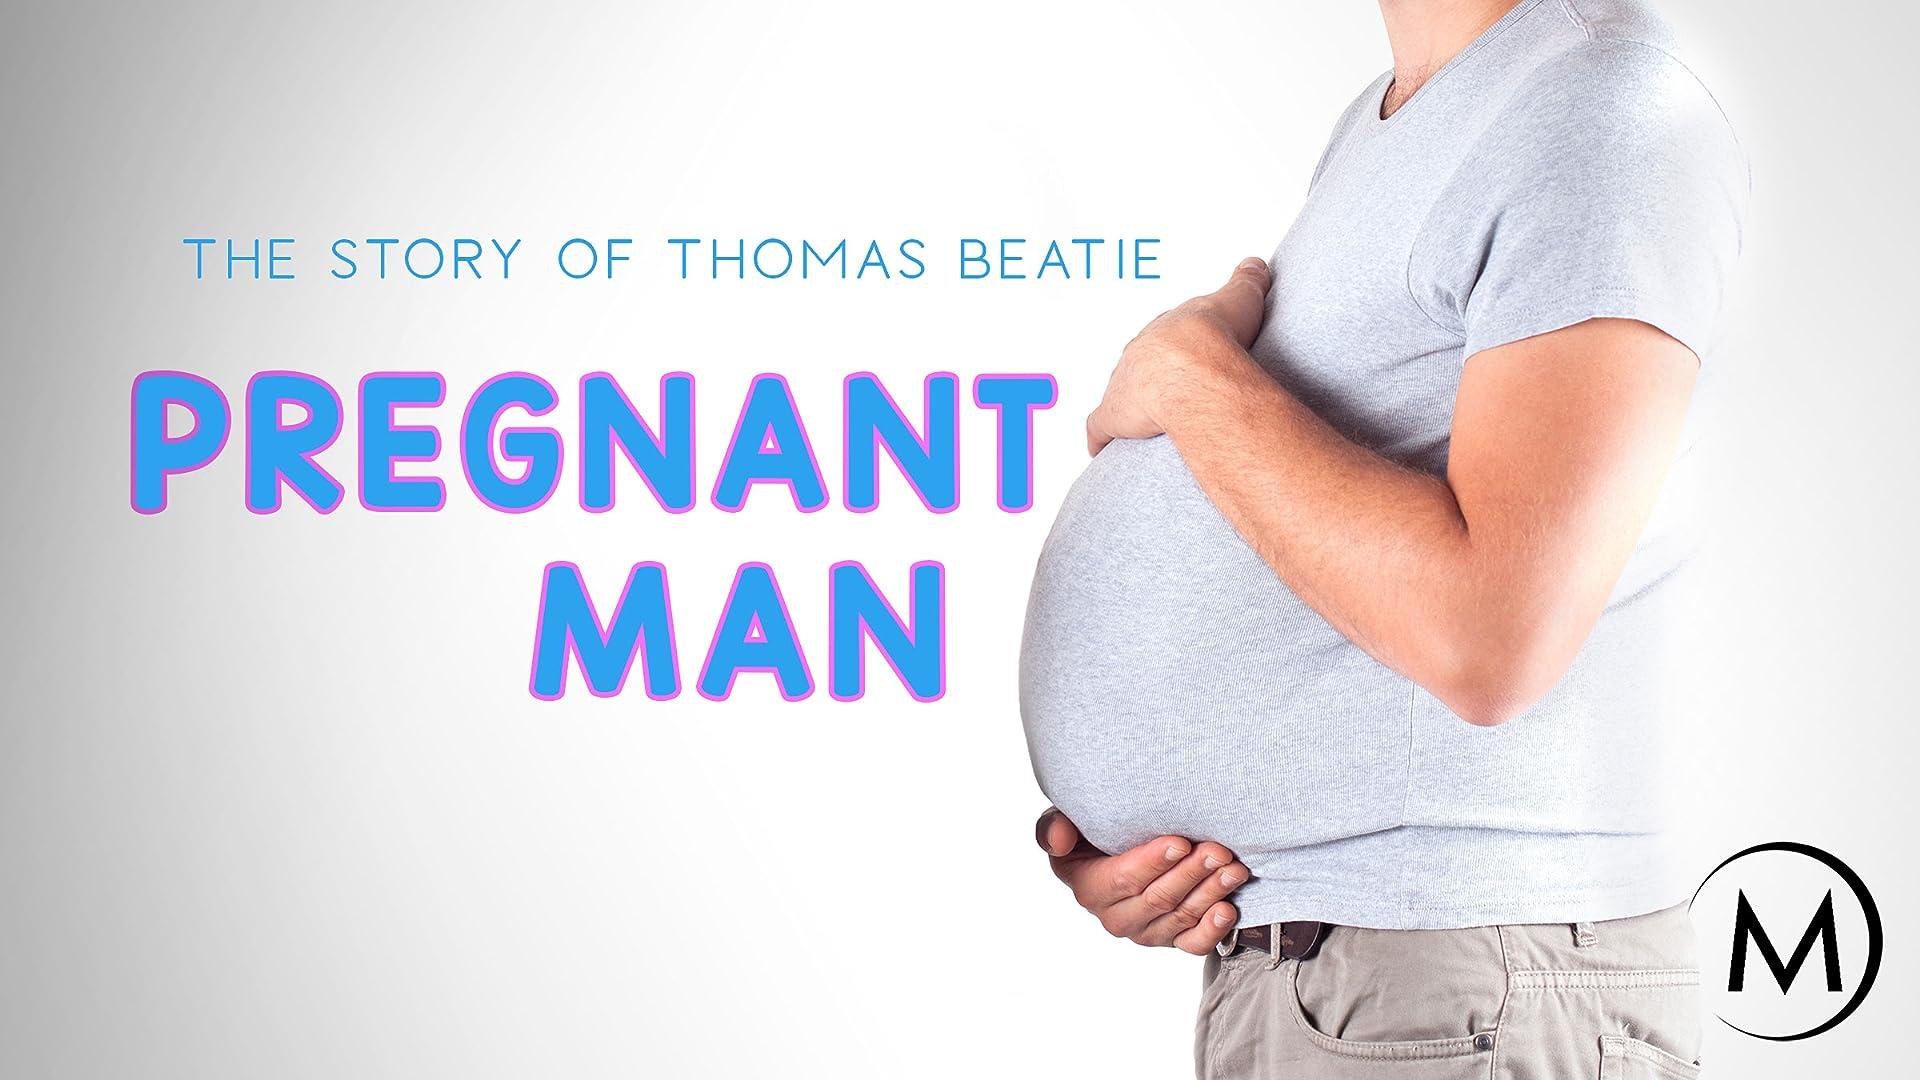 Pregnant Man: The Story of Thomas Beatie